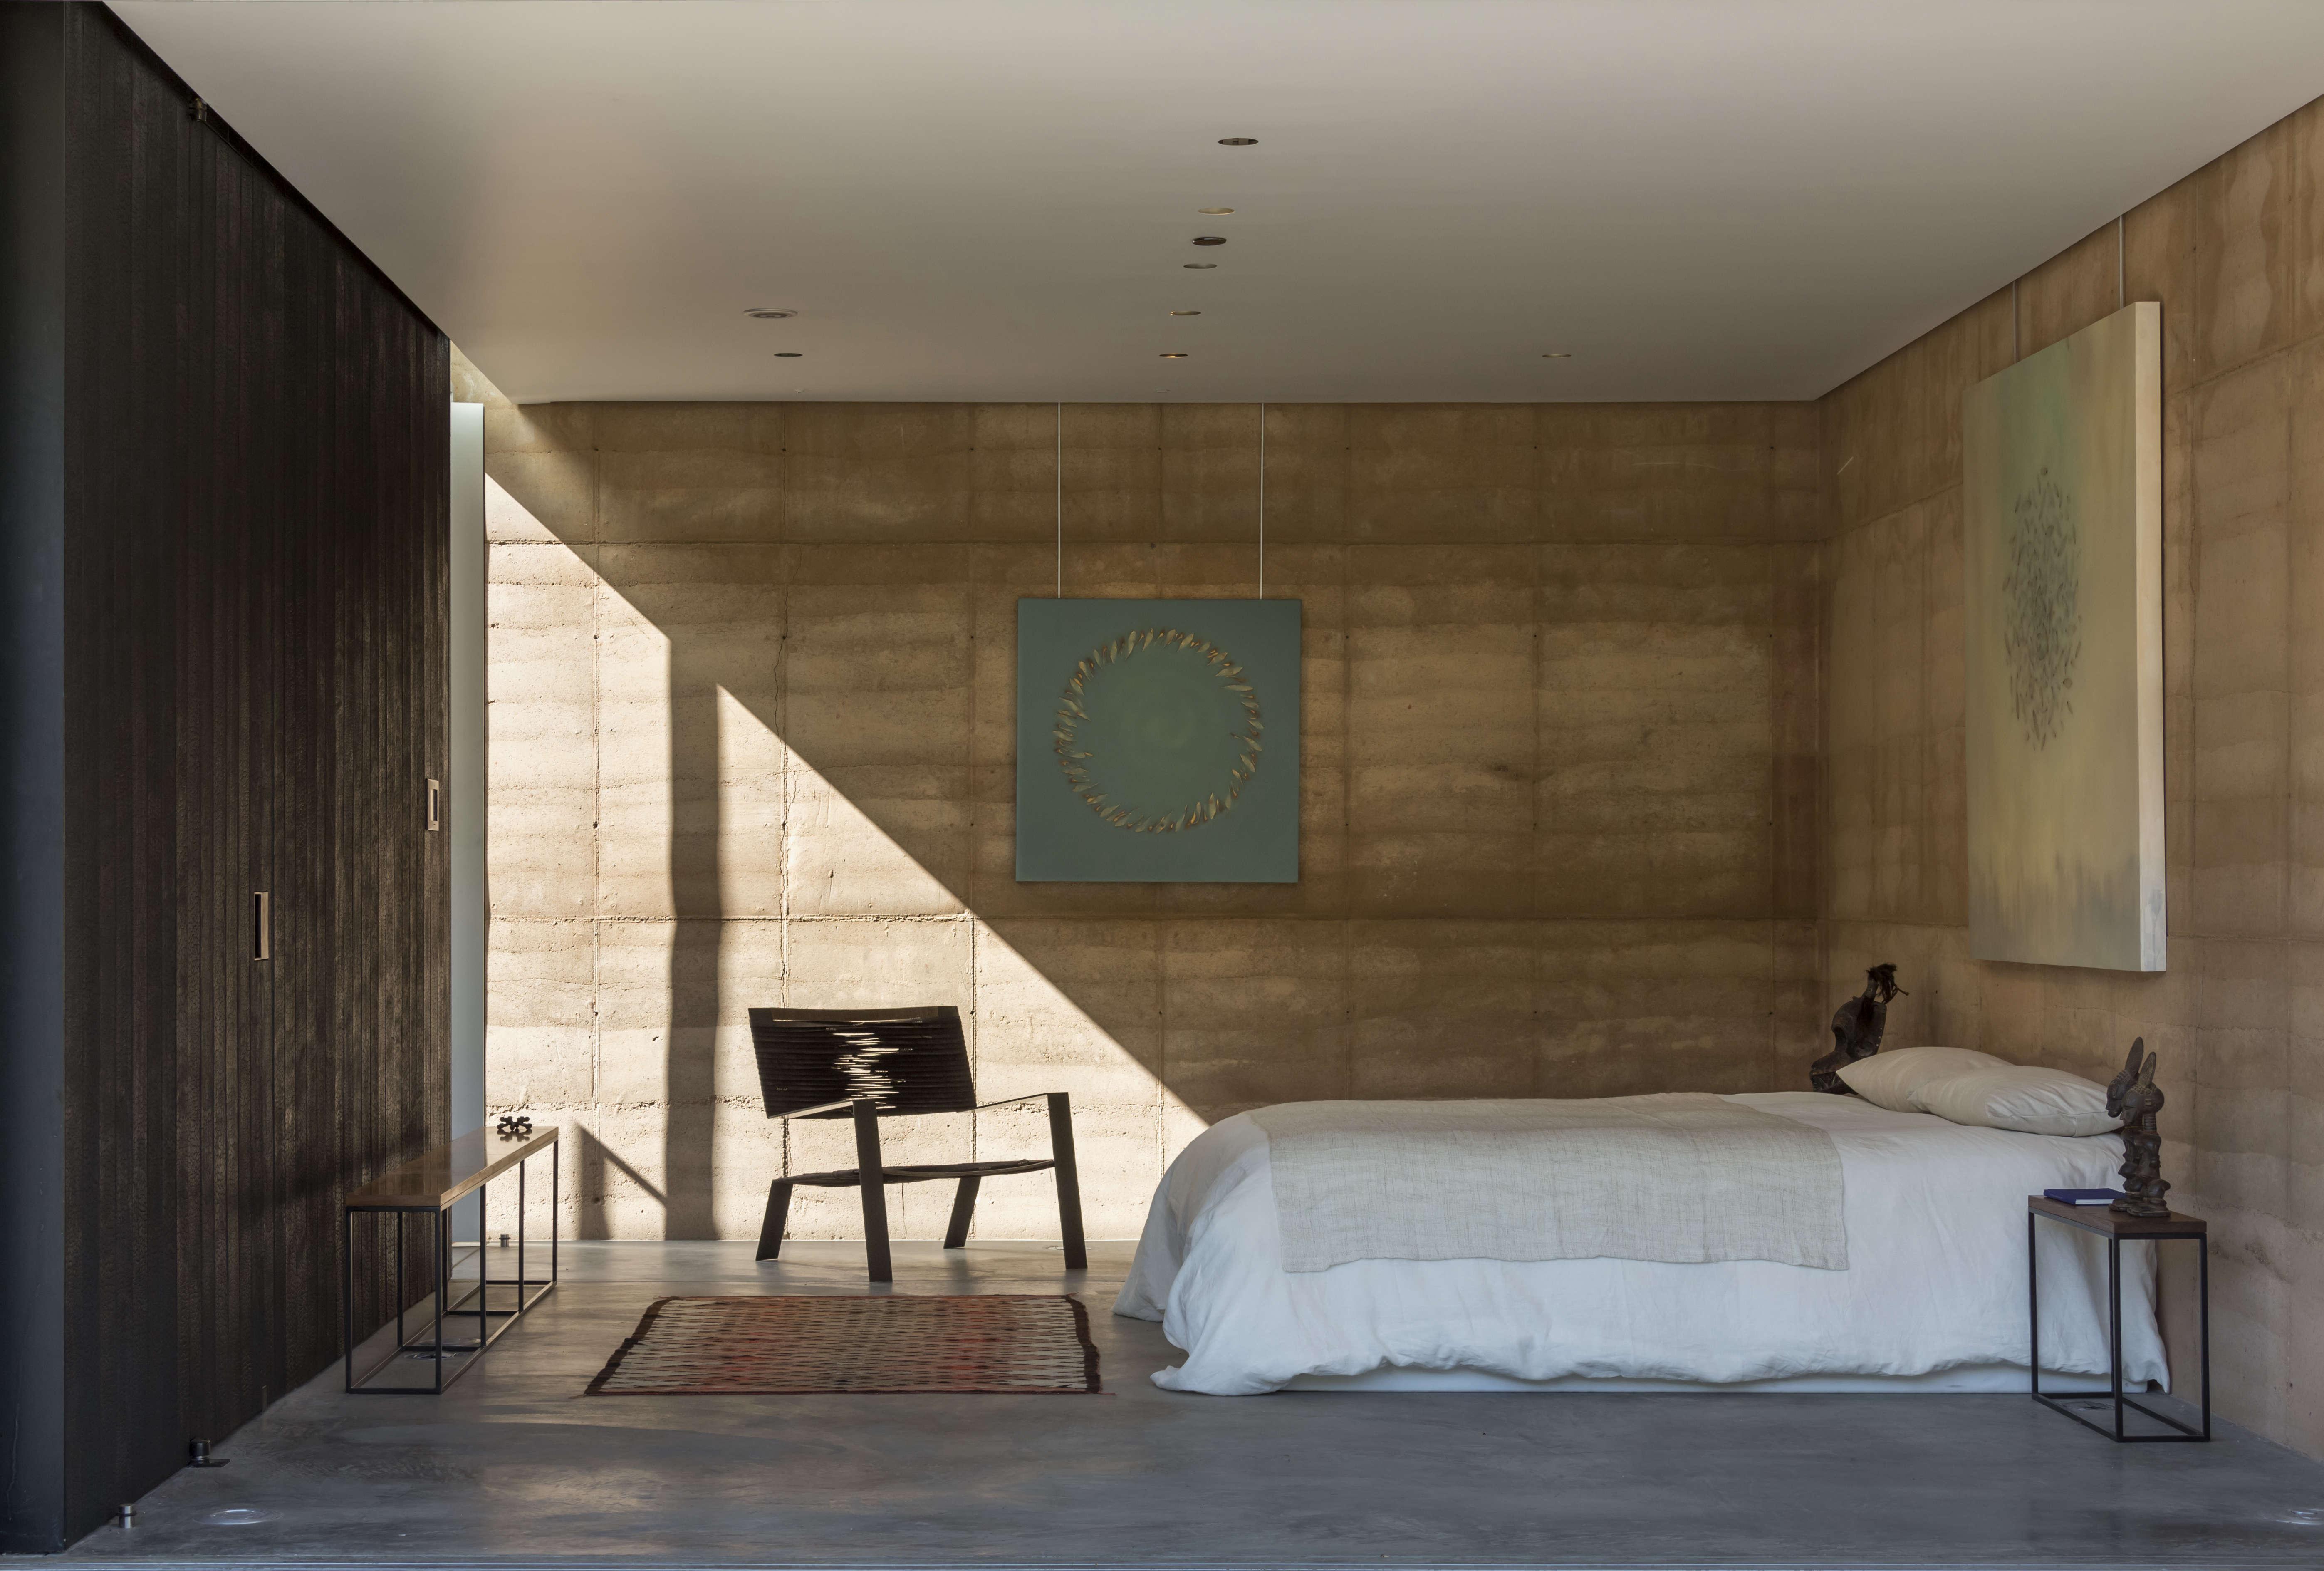 Steal This Look: Sonoran-Style Bedroom/Living Room In